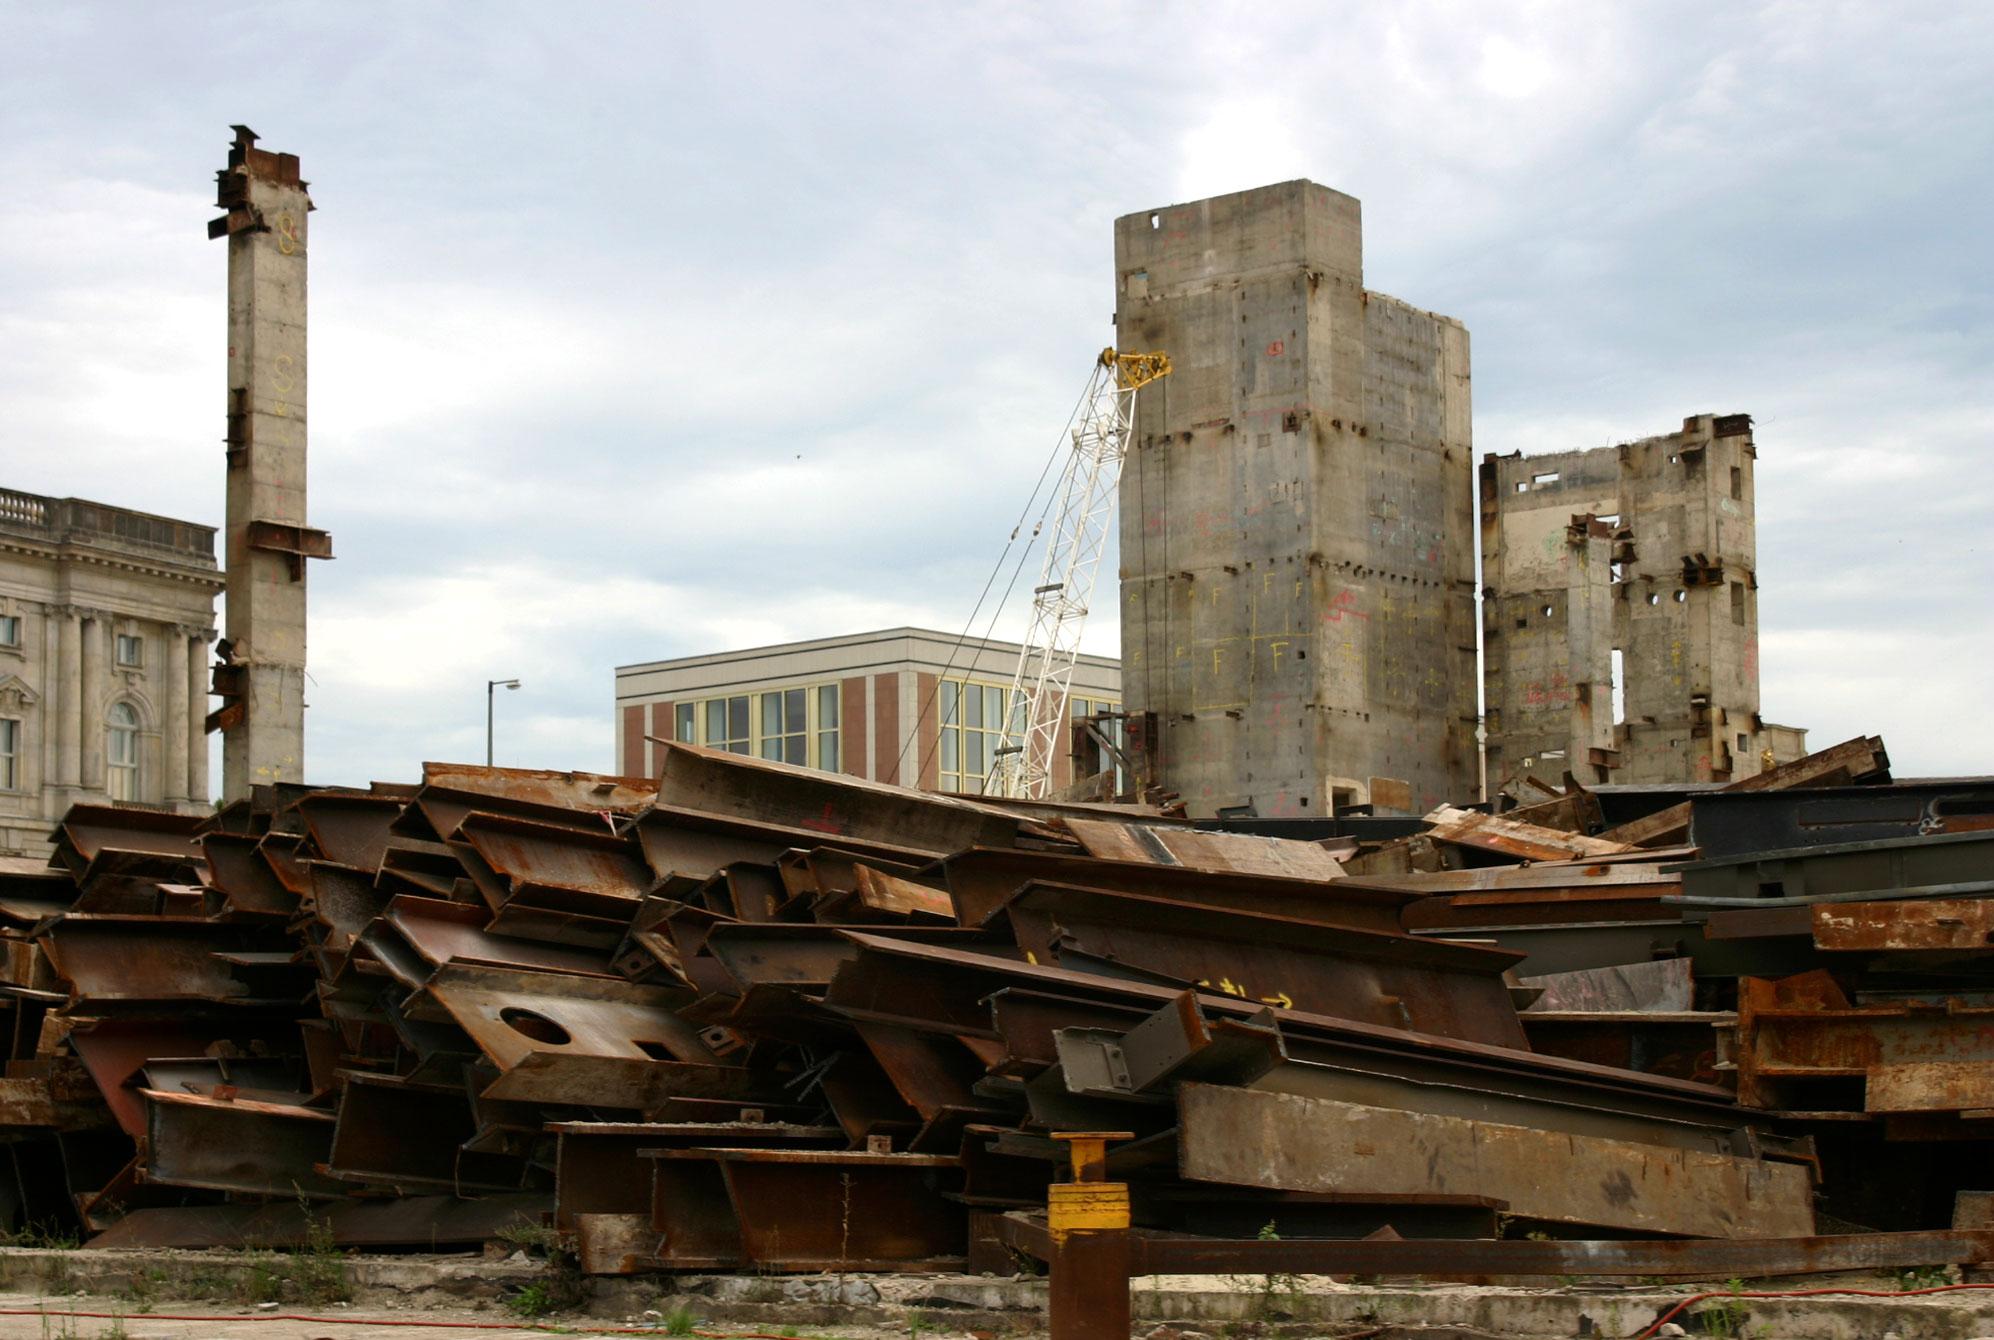 Ruinen vor der ehemaligen Staatsratgebäude